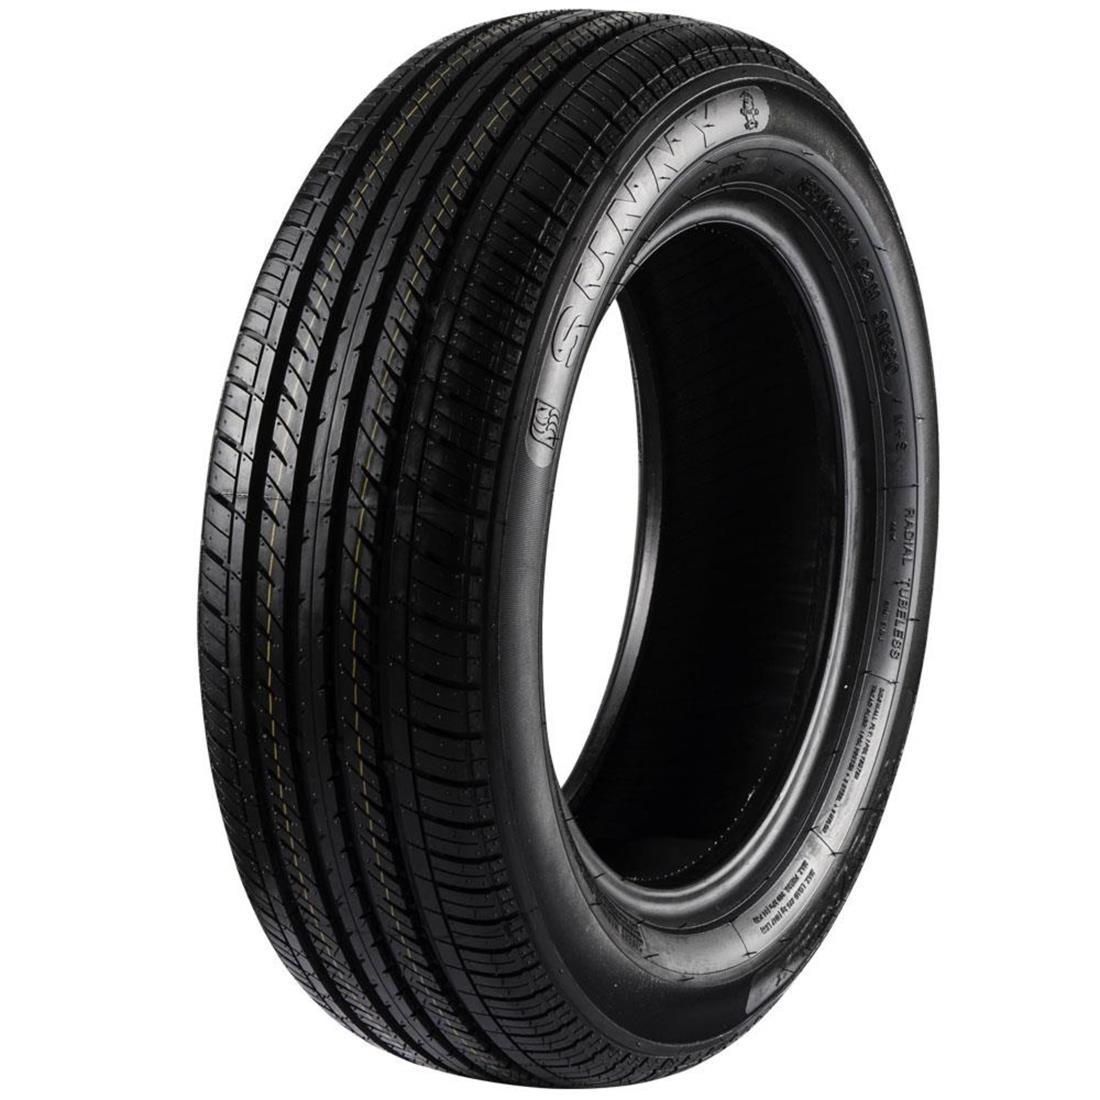 pneu sunny 195 65r15 91h sn880 carxparts est tica limpeza detalhamento automotivo pneus. Black Bedroom Furniture Sets. Home Design Ideas